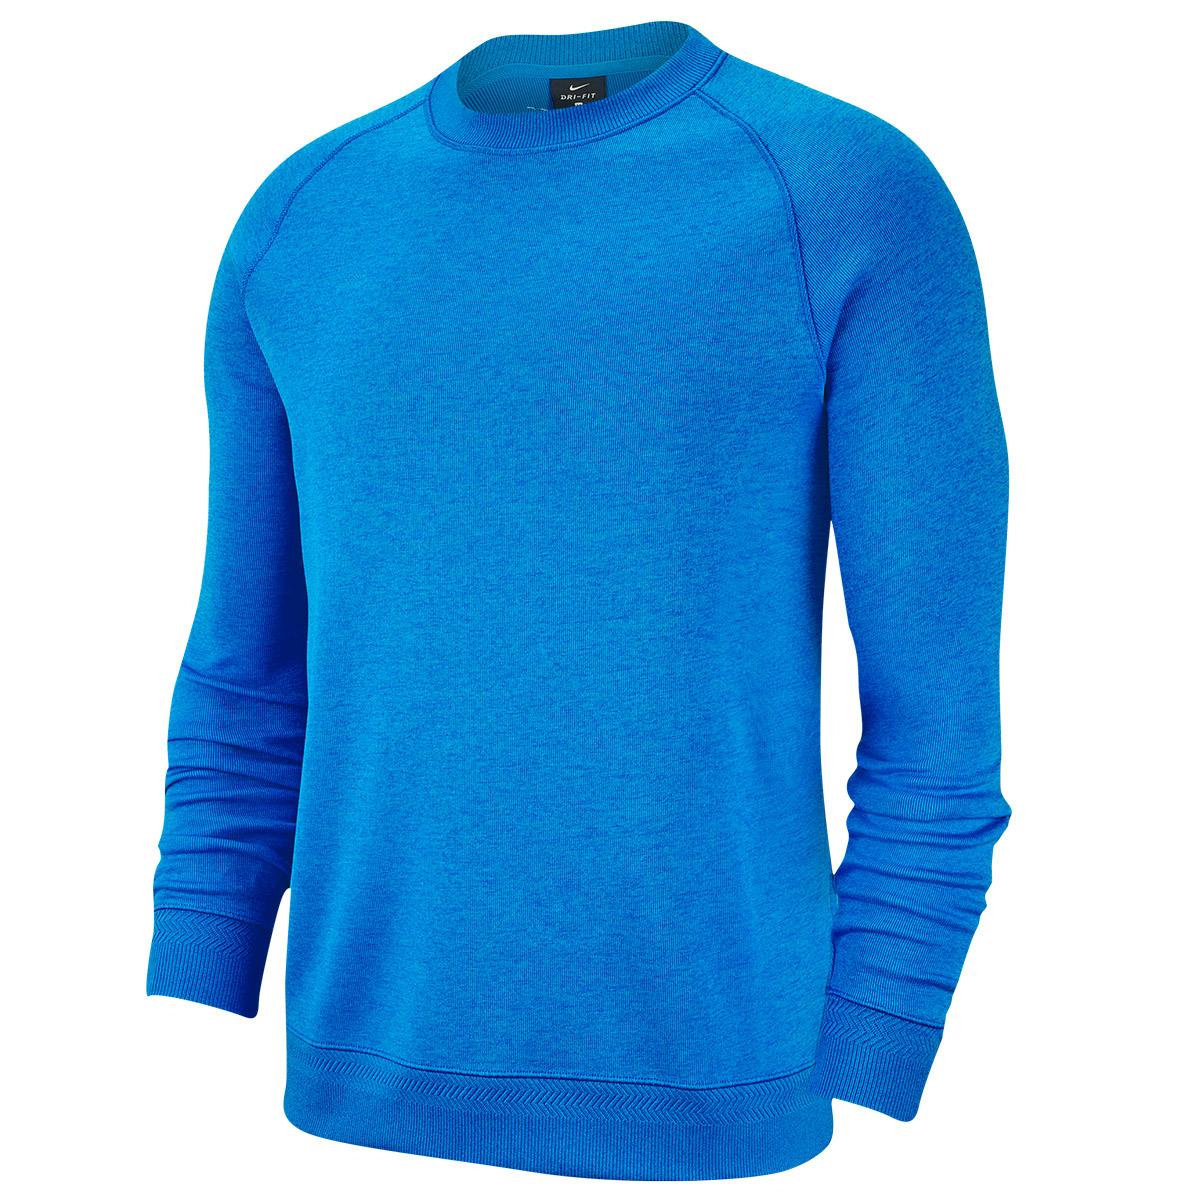 Gran cantidad gatito Shipley  Nike Golf Dri-FIT Crew Sweater | Online Golf